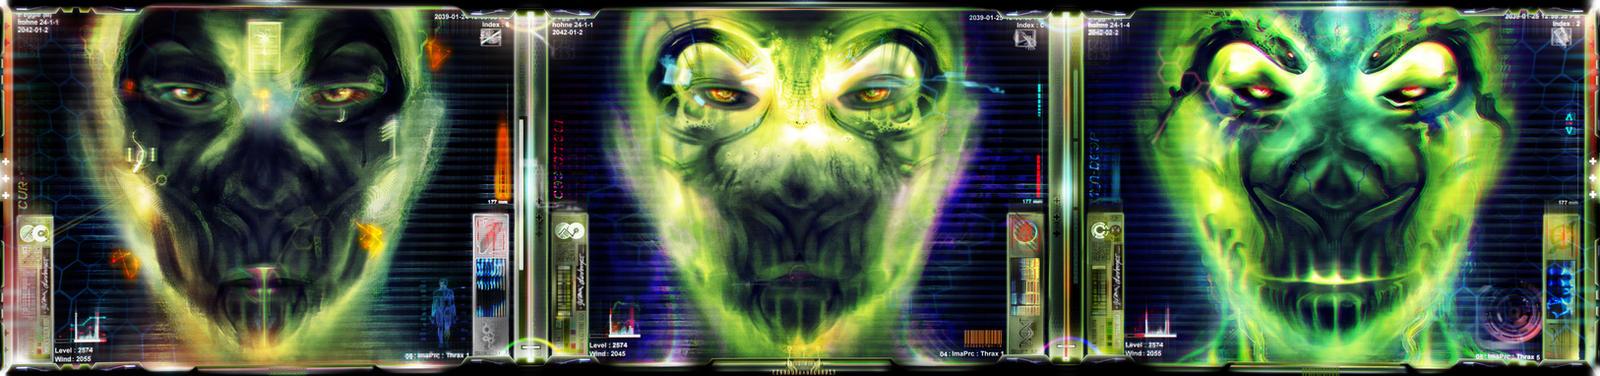 VISIONS by zero-scarecrow13